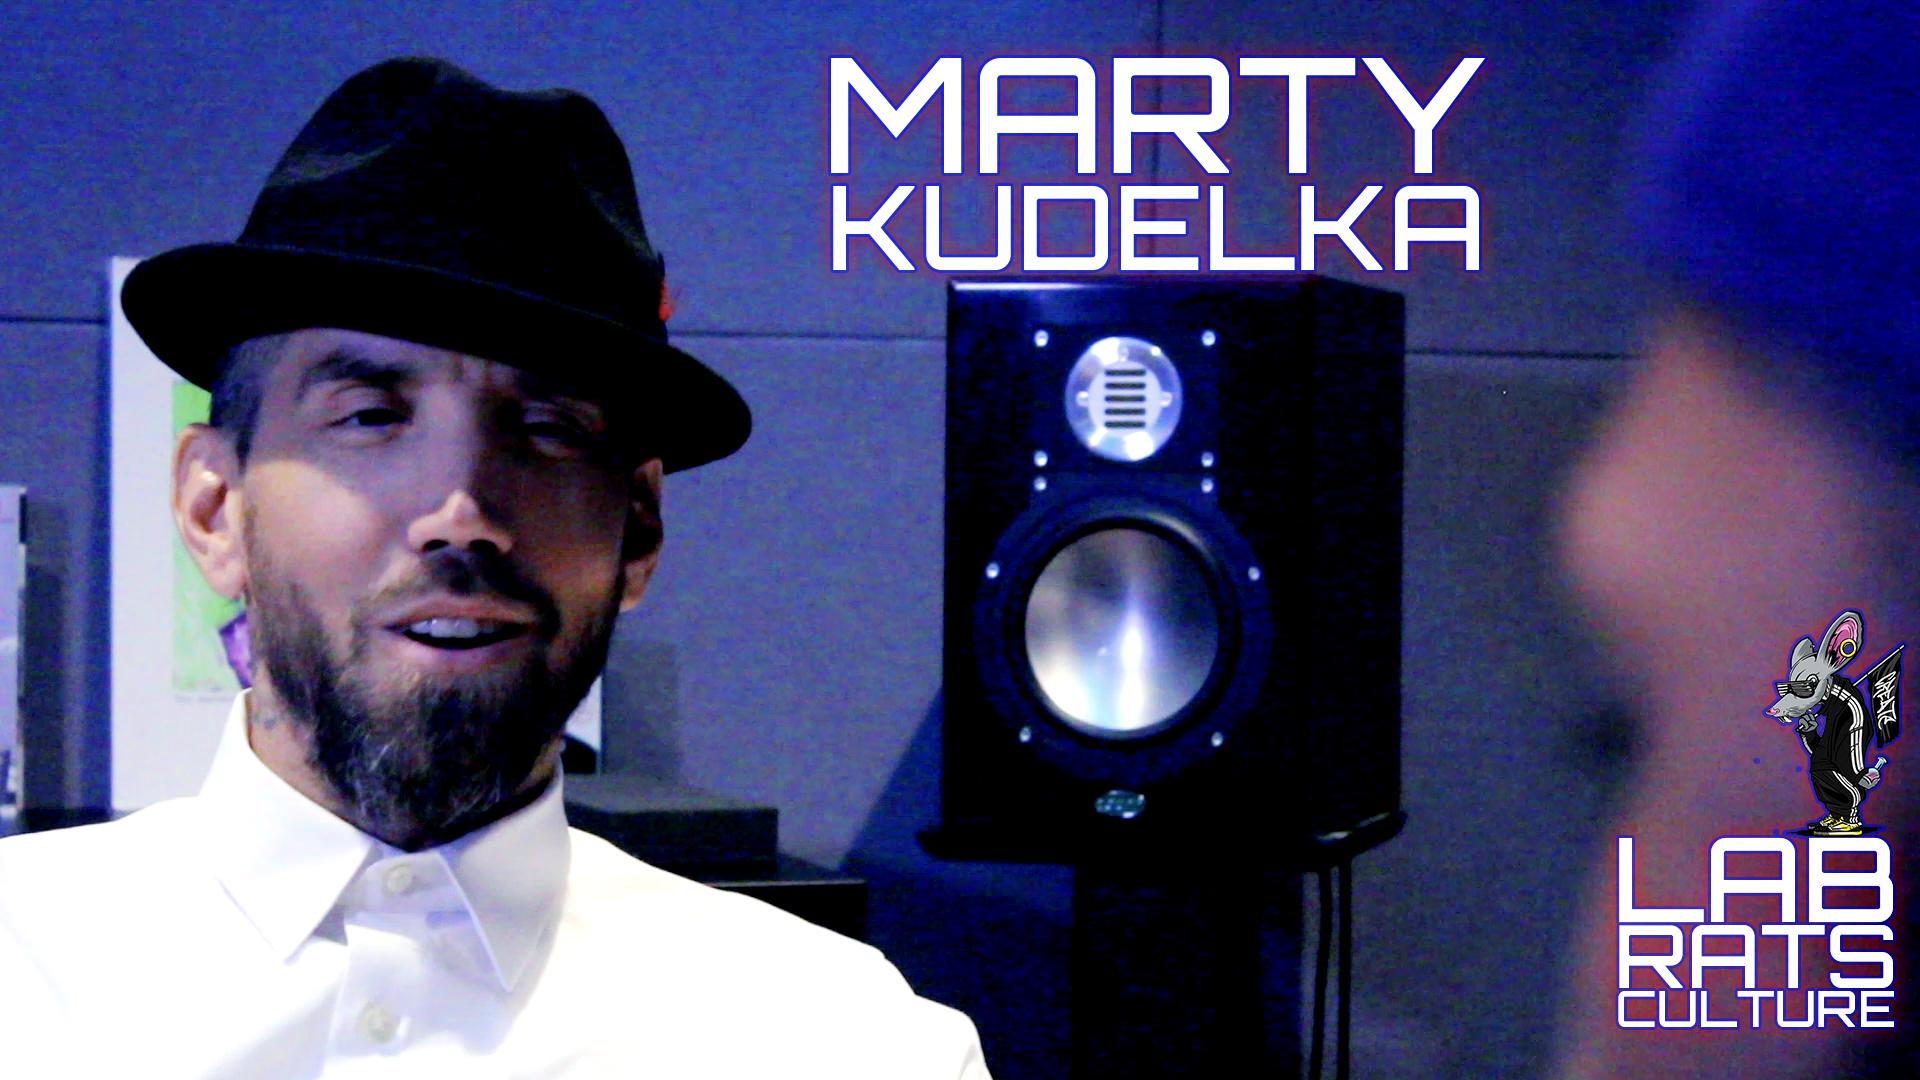 Lab Rats Culture Ep. 08 - Marty Kudelka